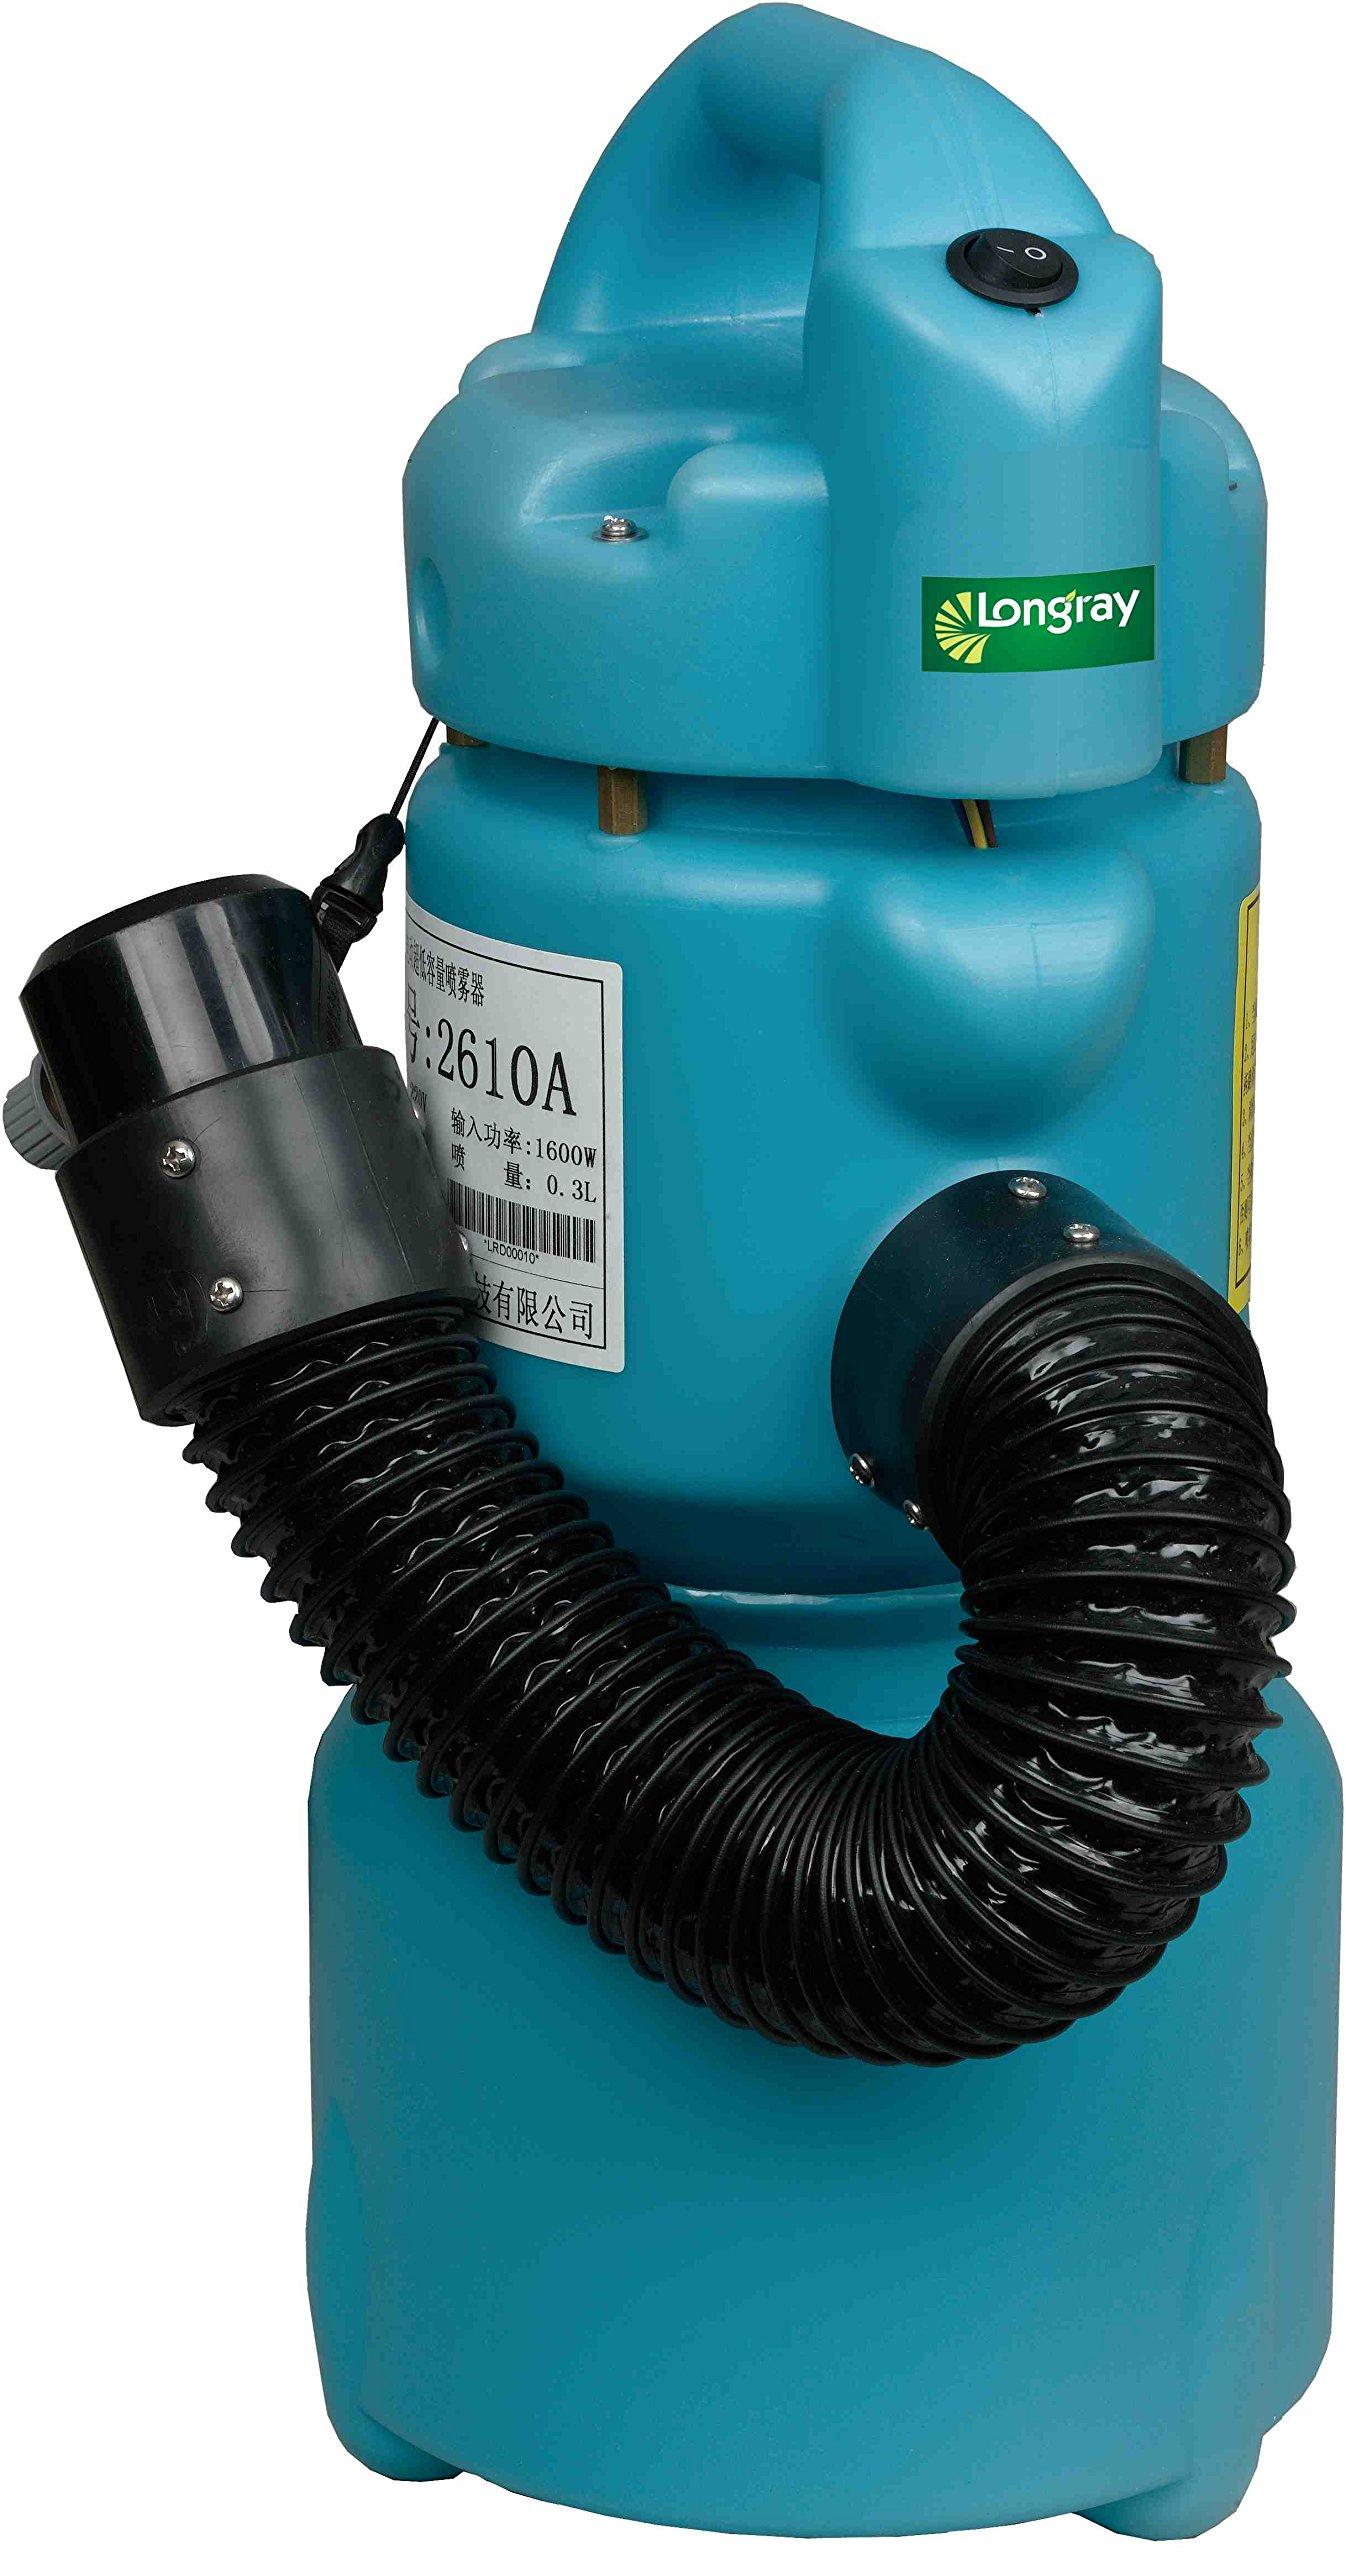 Longray Basic ULV Fogger with Adjustable Flow & Flex-Hose by Longray